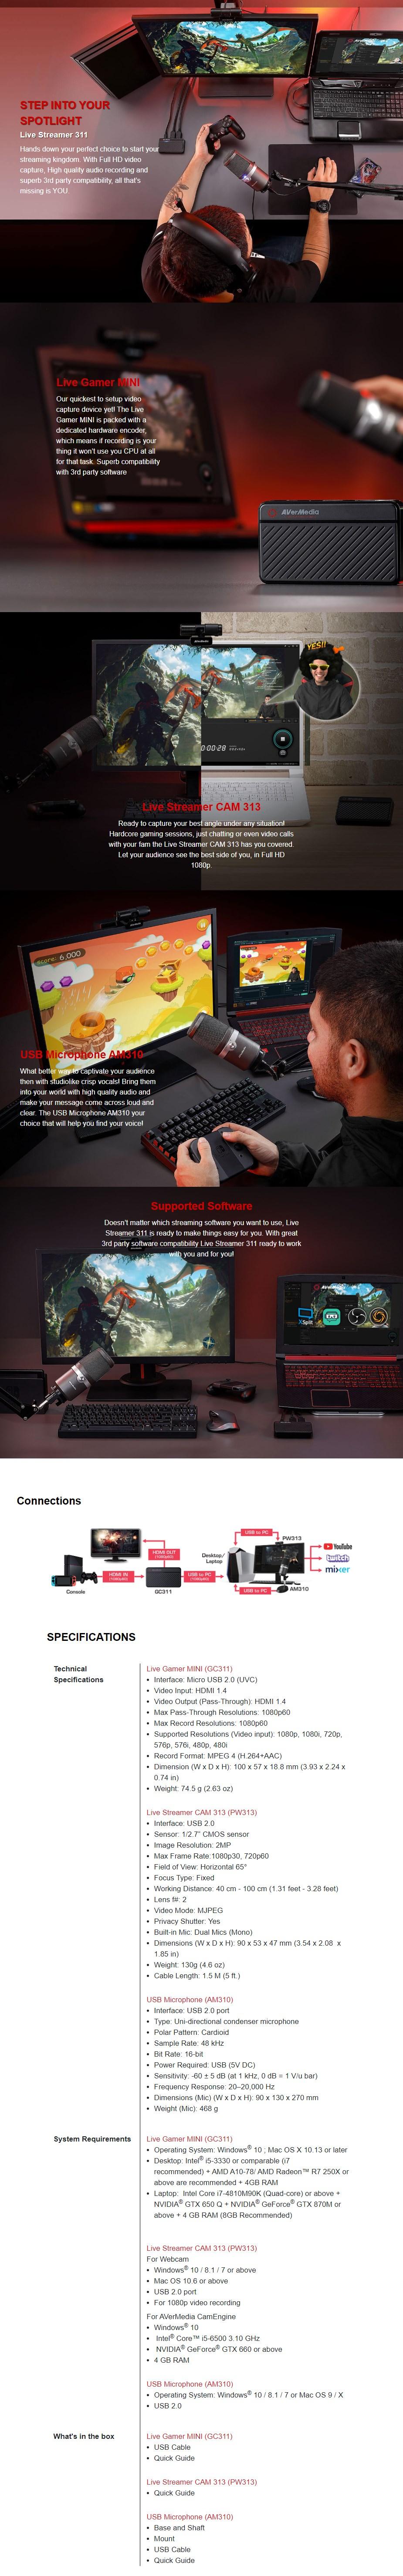 AVerMedia Live Streamer 311 Kit - Live Gamer MINI, CAM313  and USB Mic AM310 - Overview 1